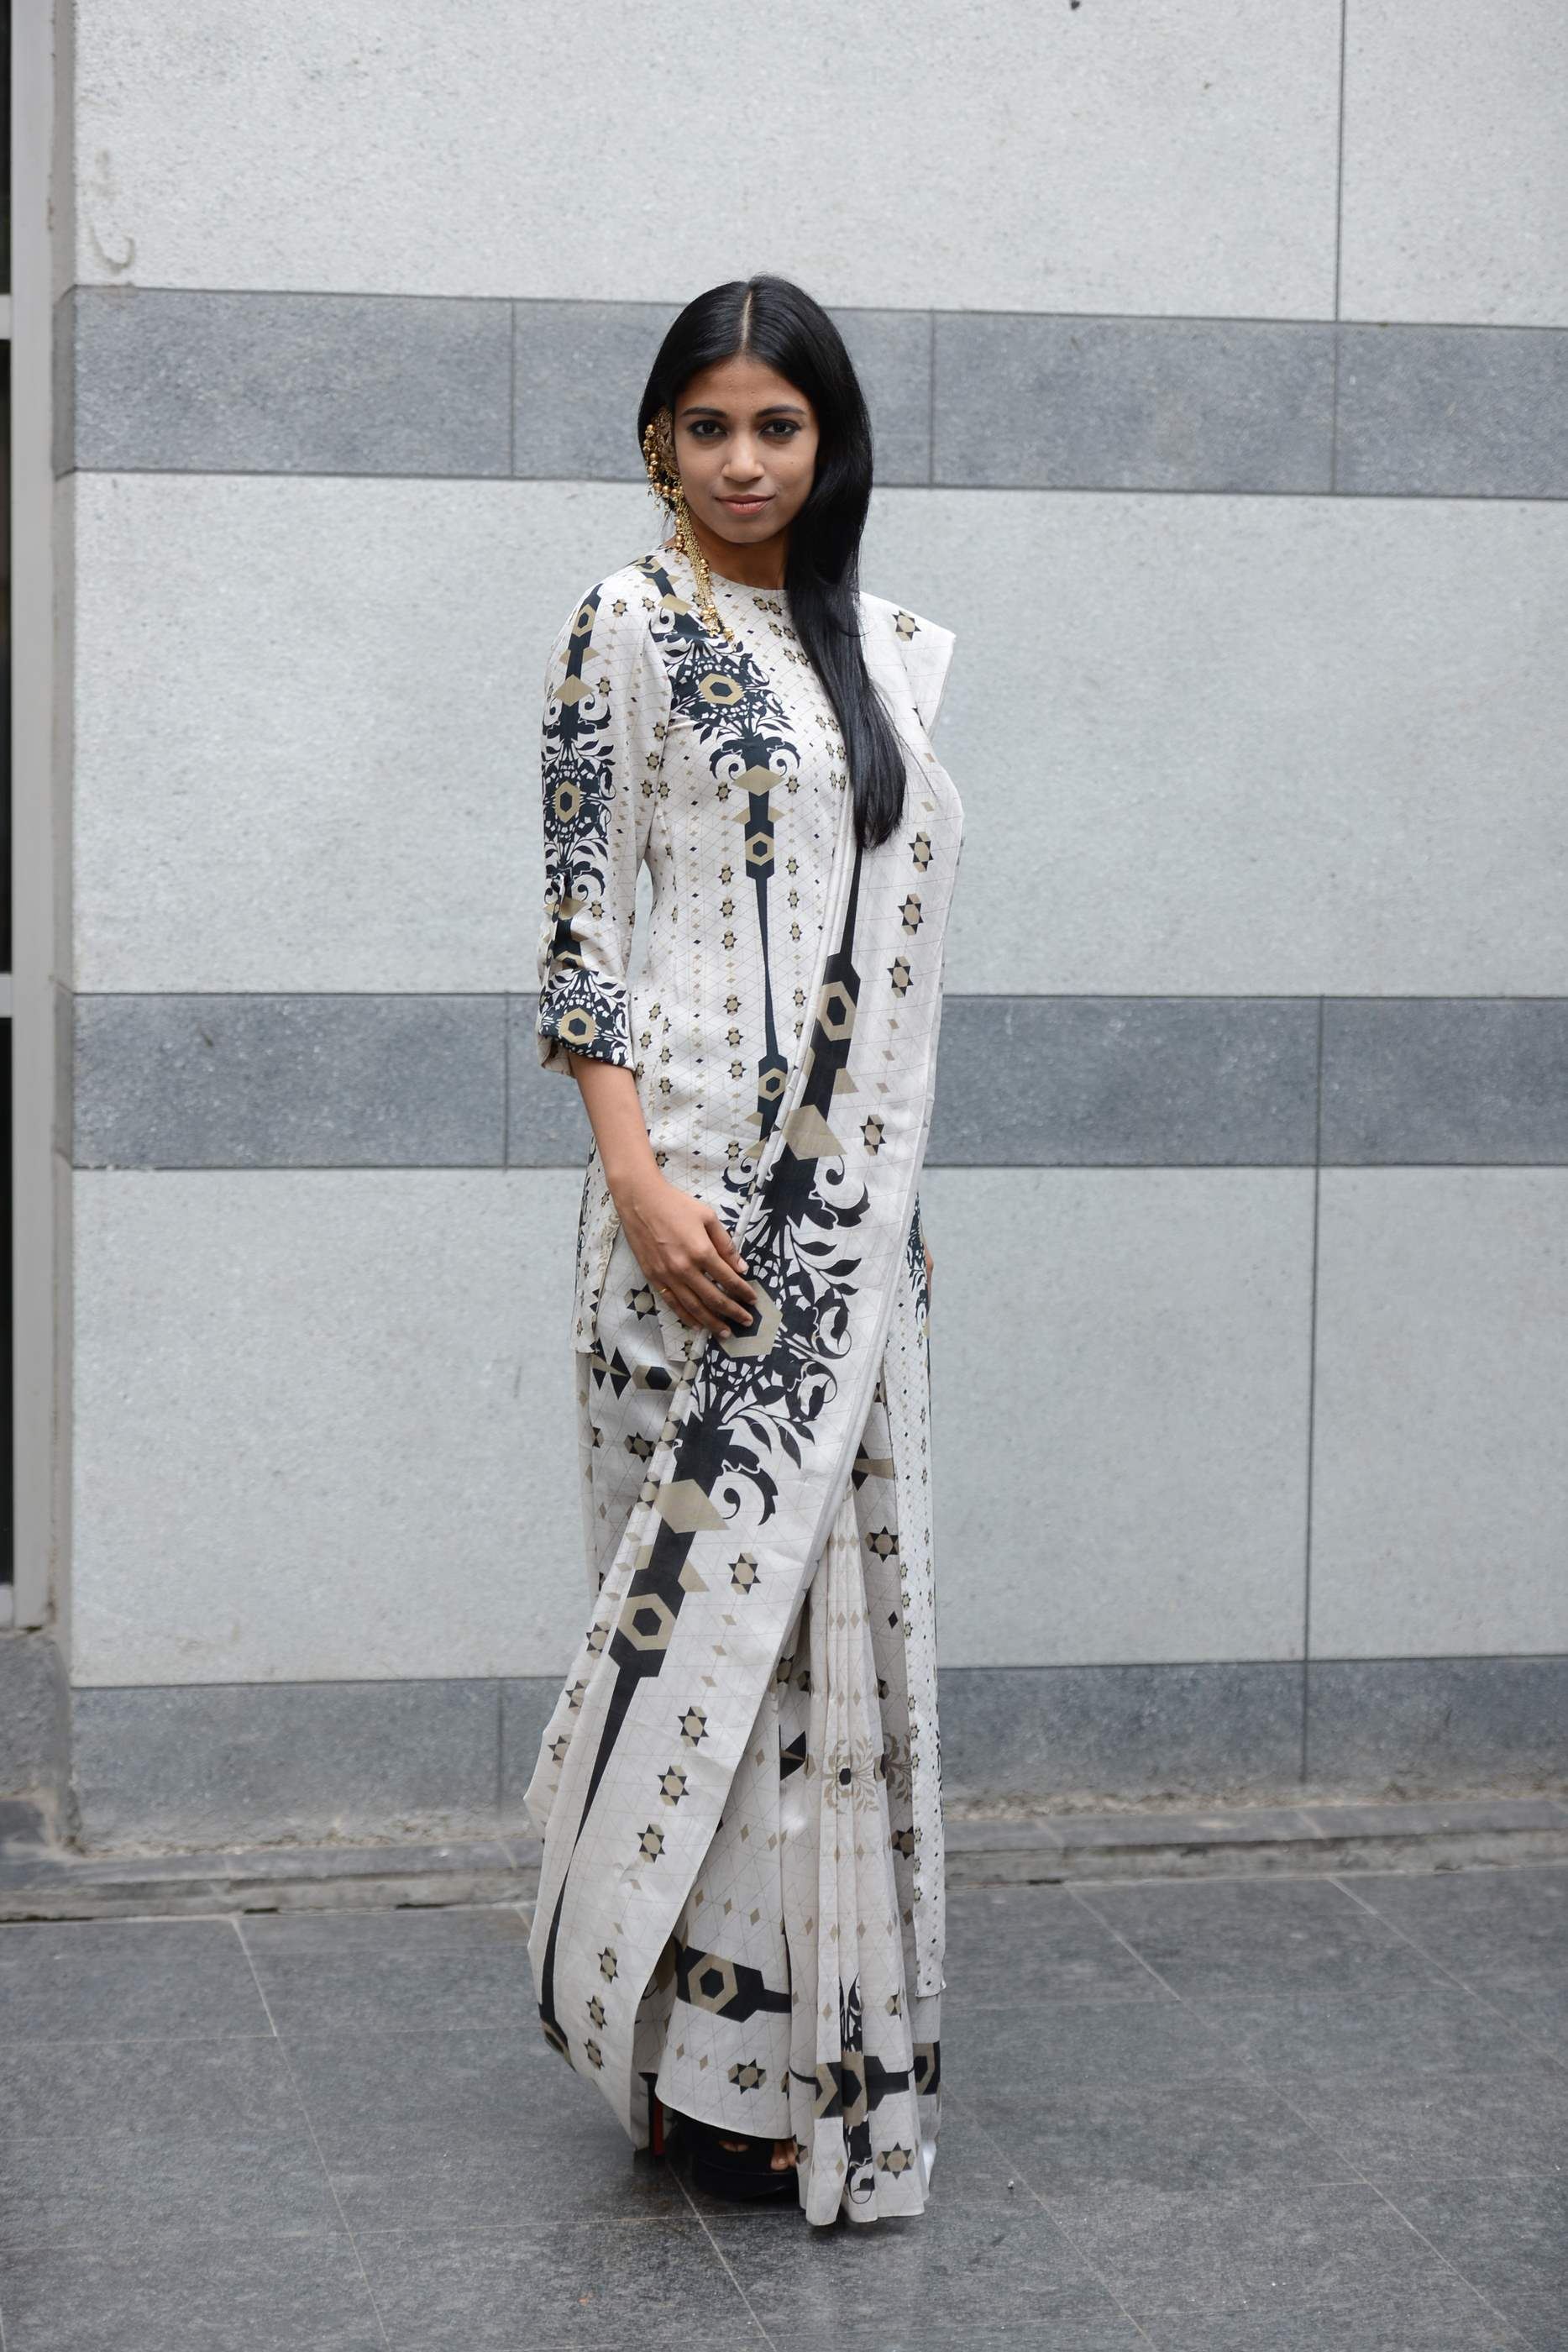 Bhagyashree Raut dressed in Lady Sahara by Payal Singhal